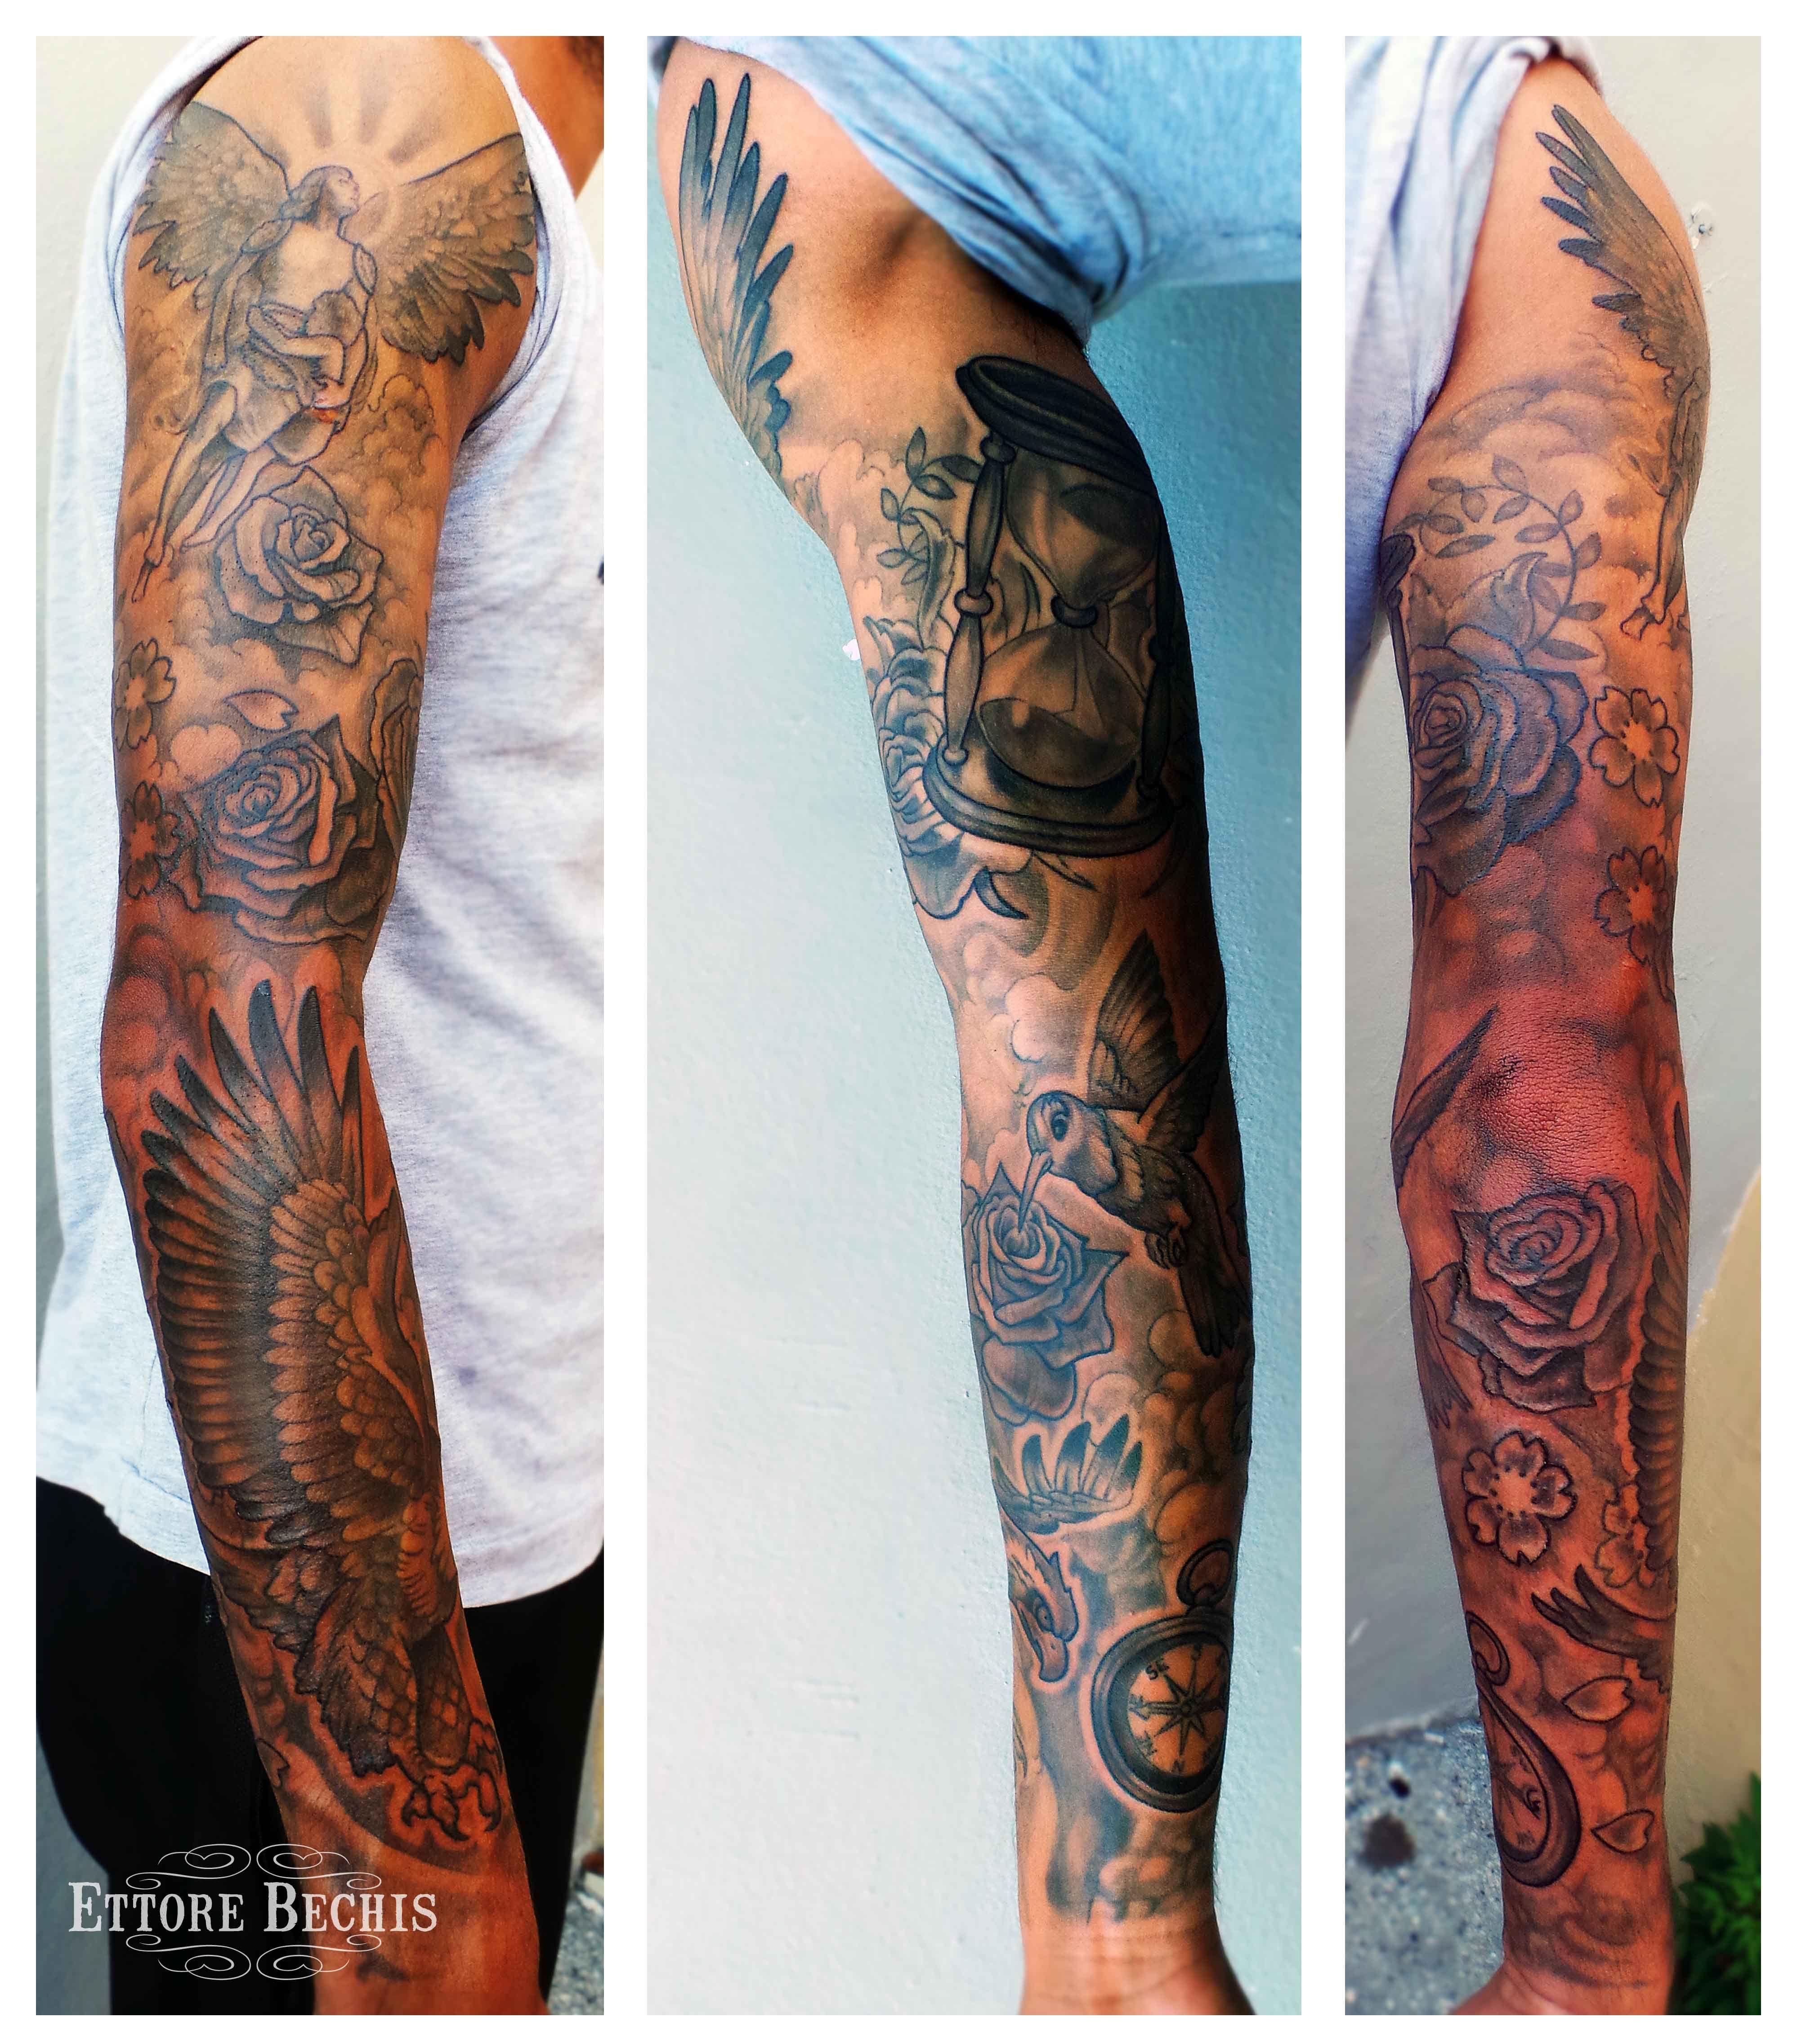 Japanese sleeve tattoos designs and ideas - Www Ettore Bechis Com Best Miami Tattoo Shop Full Sleeve Tattoo Tattoo